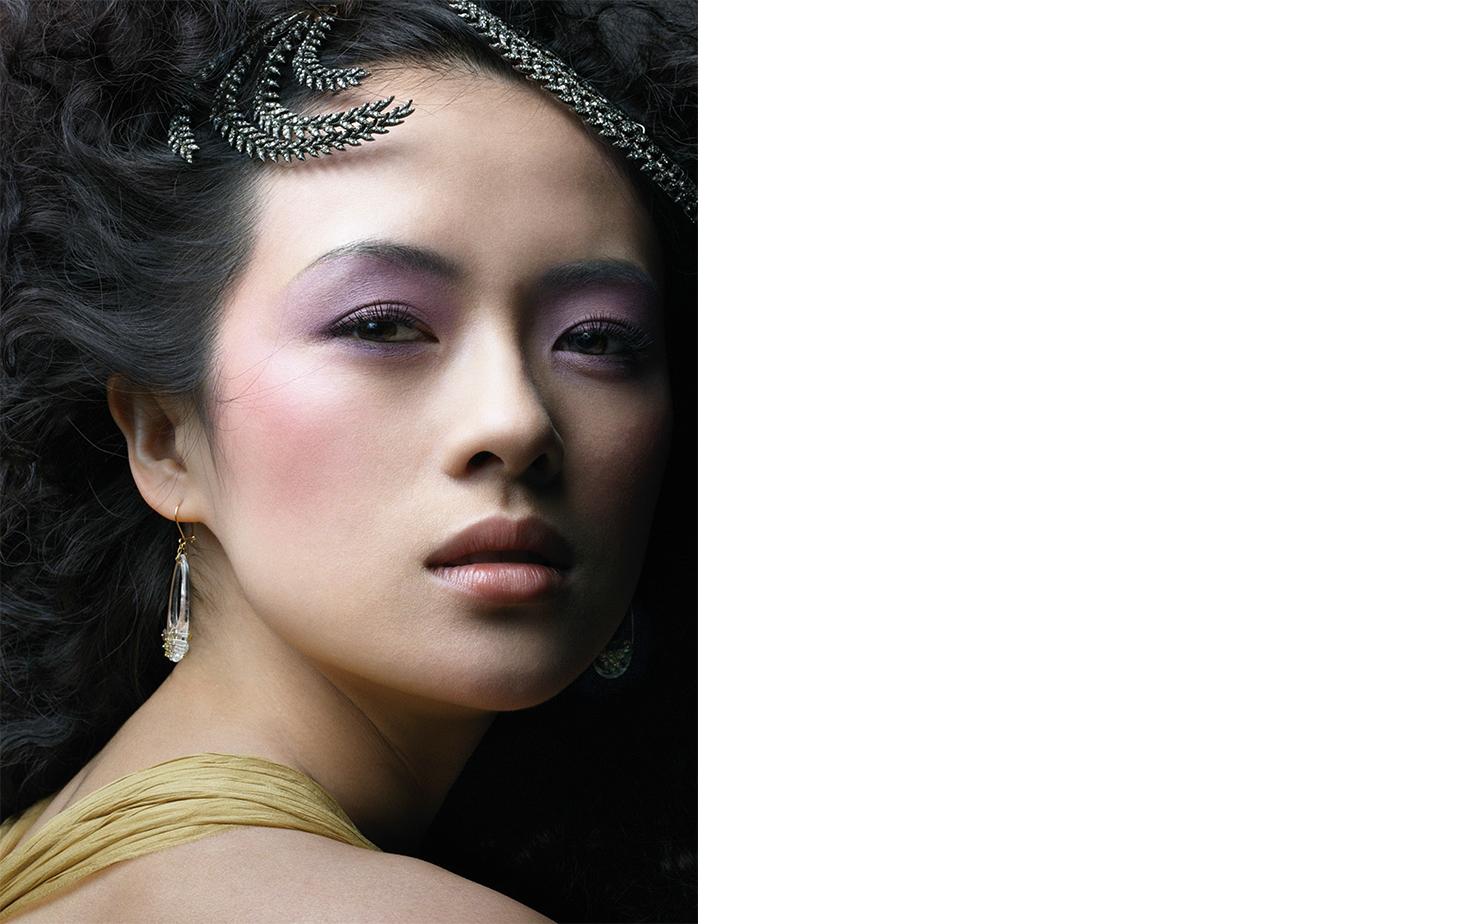 T Magazine   ZIYI ZHANG   FASHION EDITOR Tiina Laakkonen MAKE UP Fulvia Farolfi